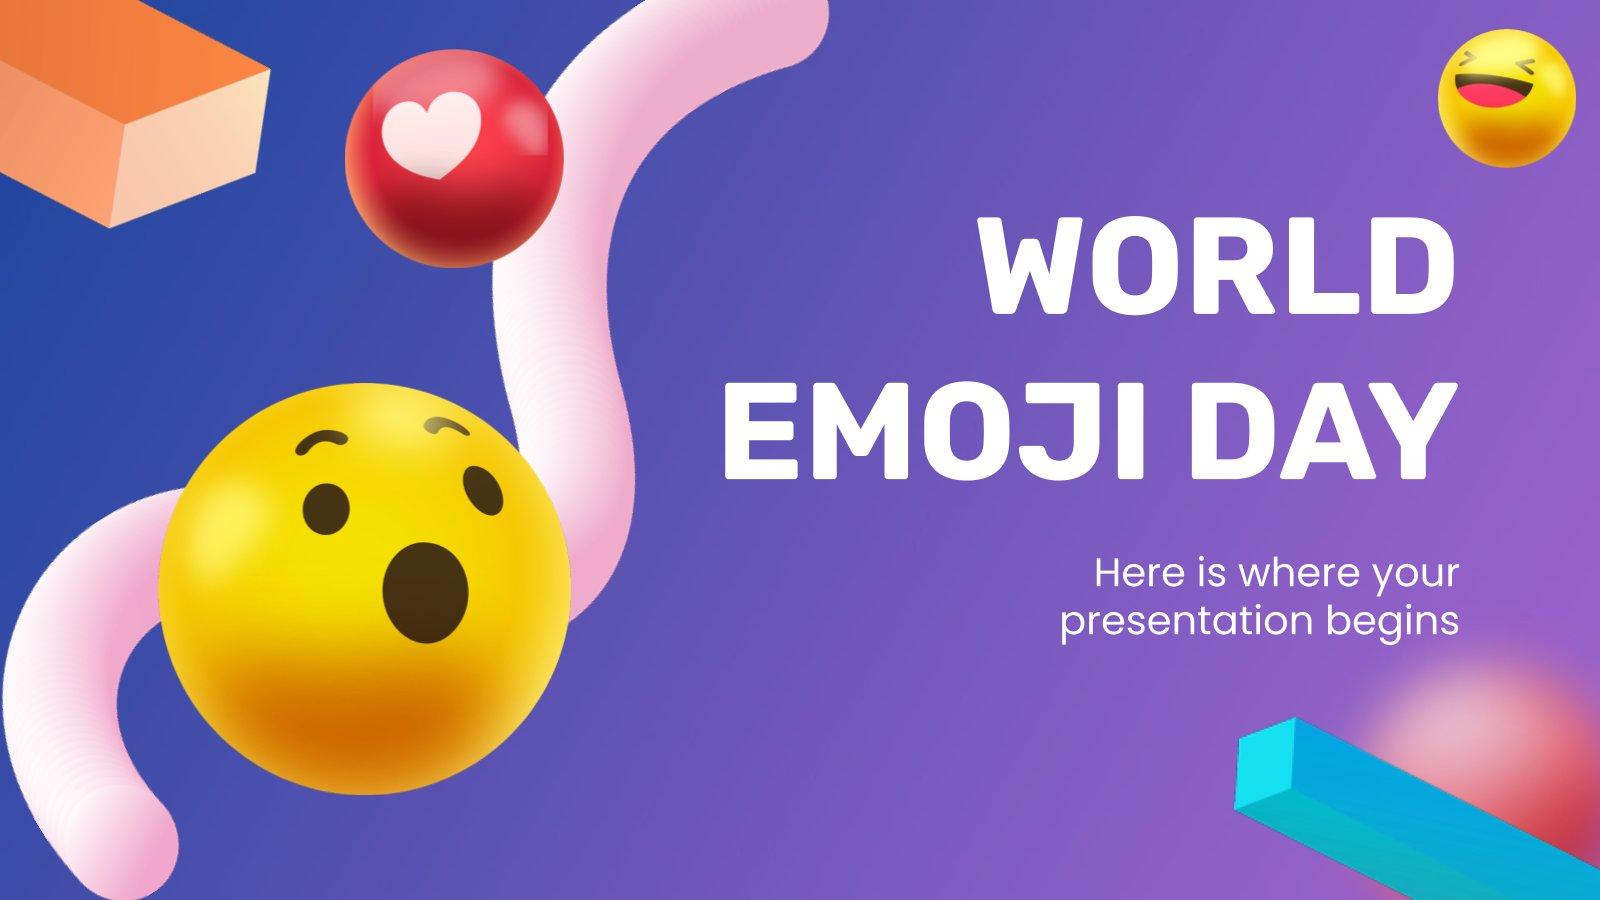 Welt-Emoji-Tag Präsentationsvorlage